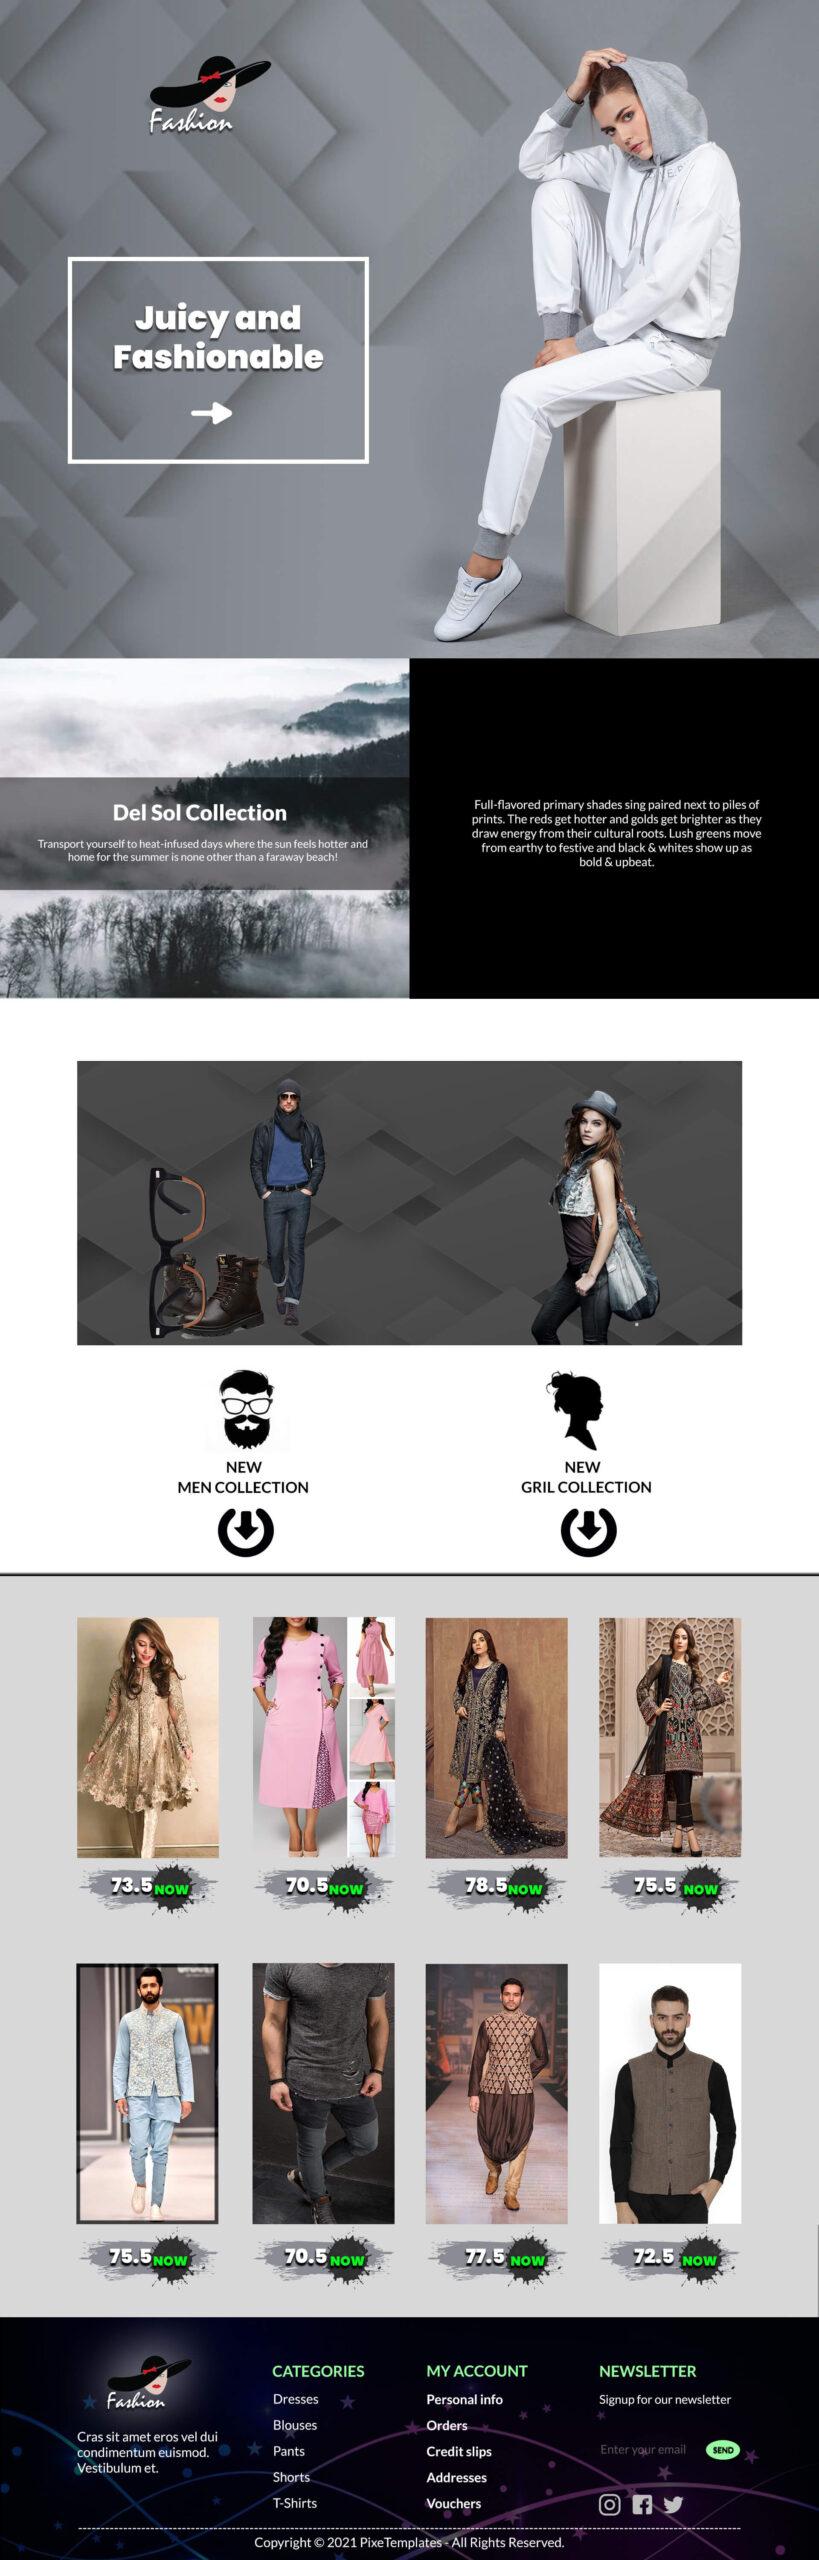 Fashion & Beauty Web Template for Free